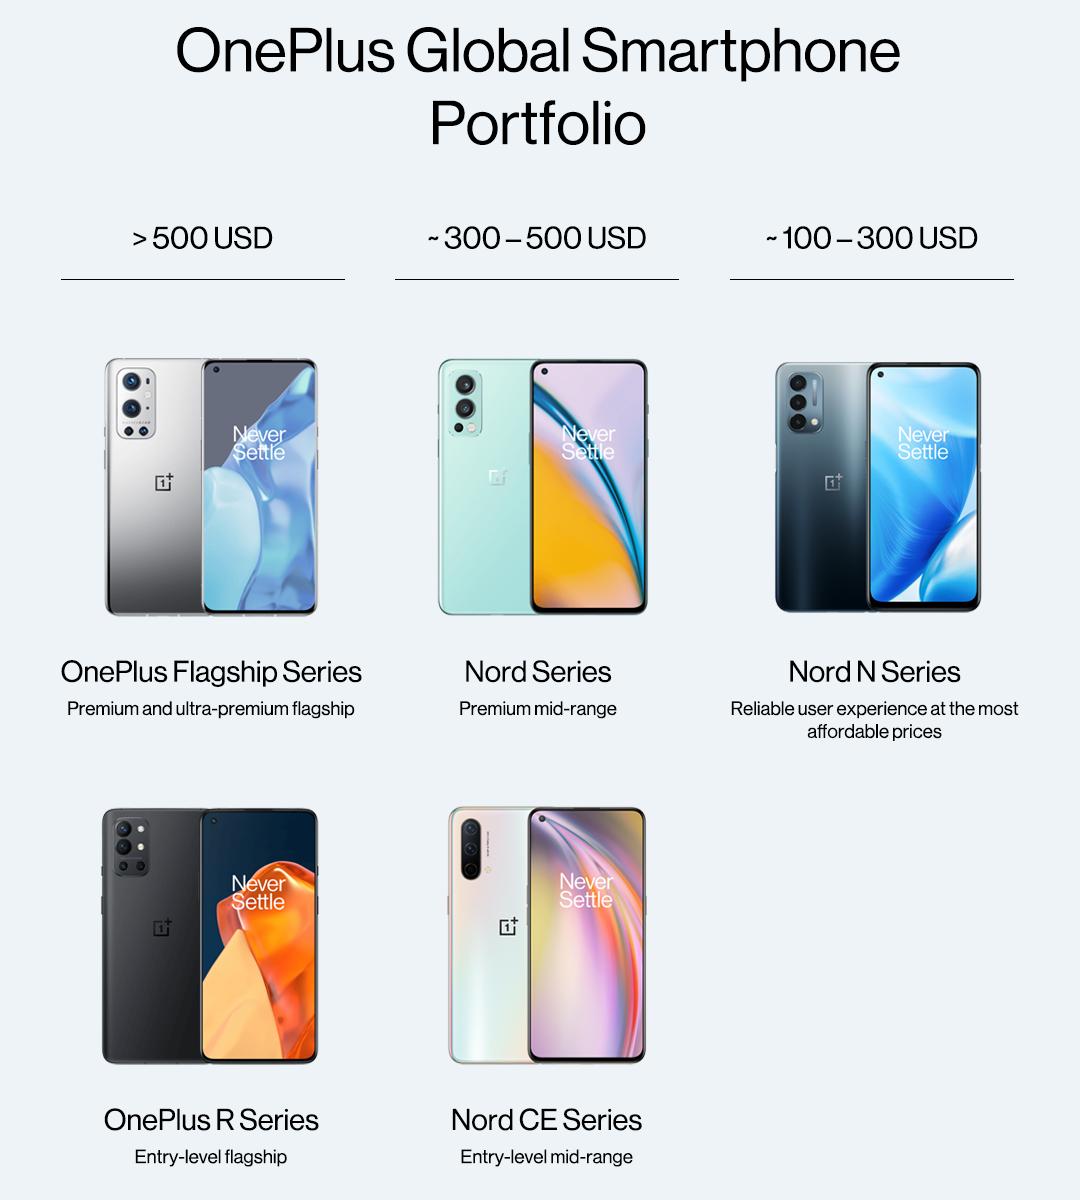 oneplus 2.0 portfolio smartphone